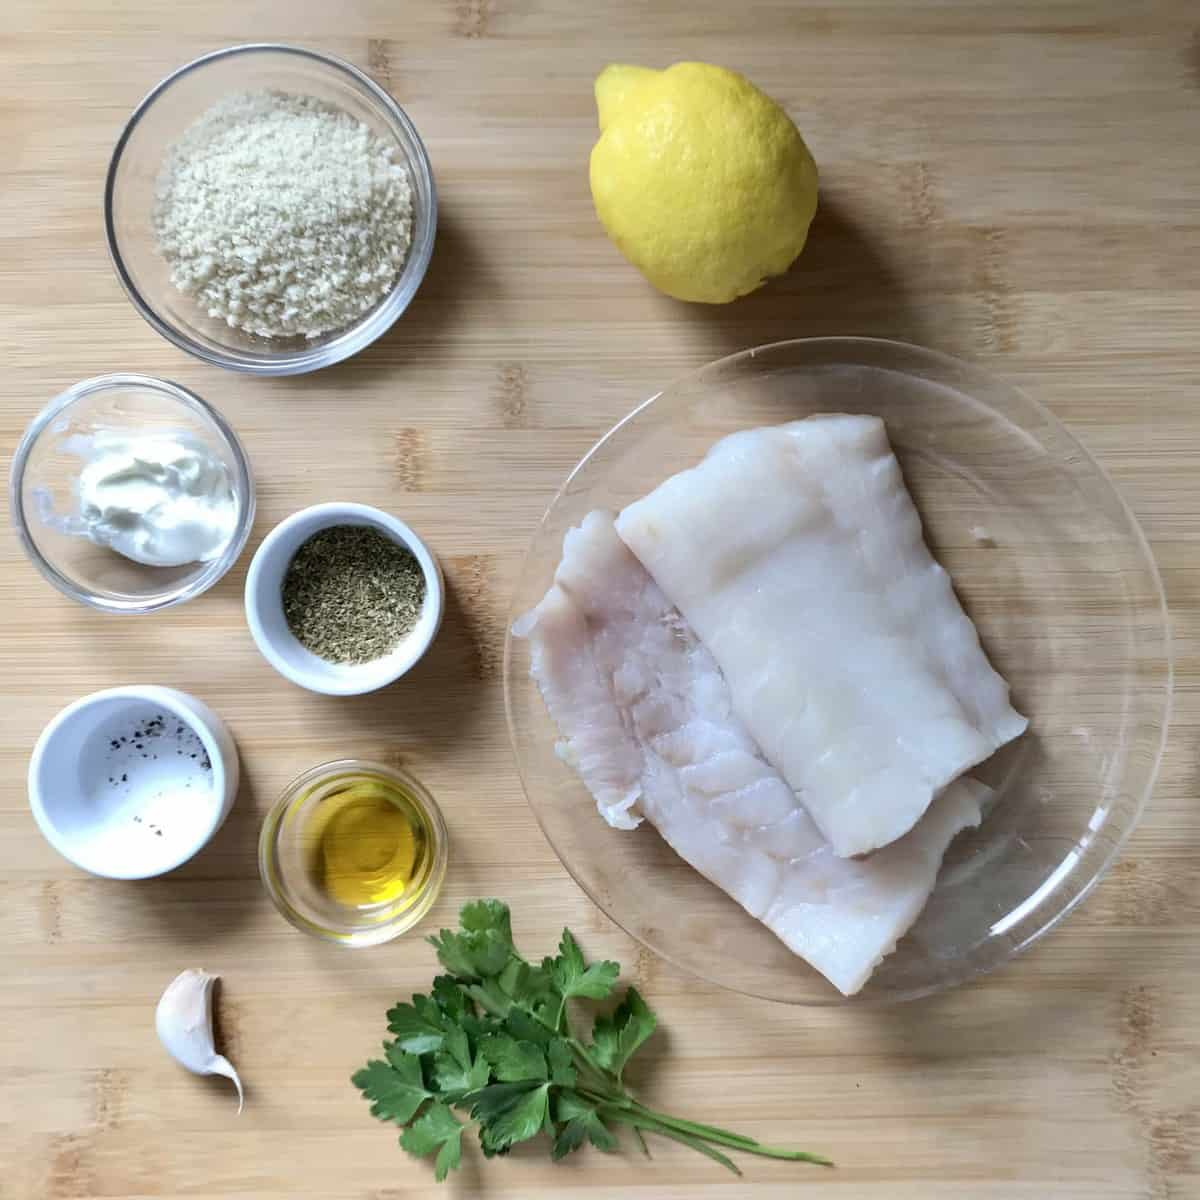 Ingredients to make cod in an air fryer.